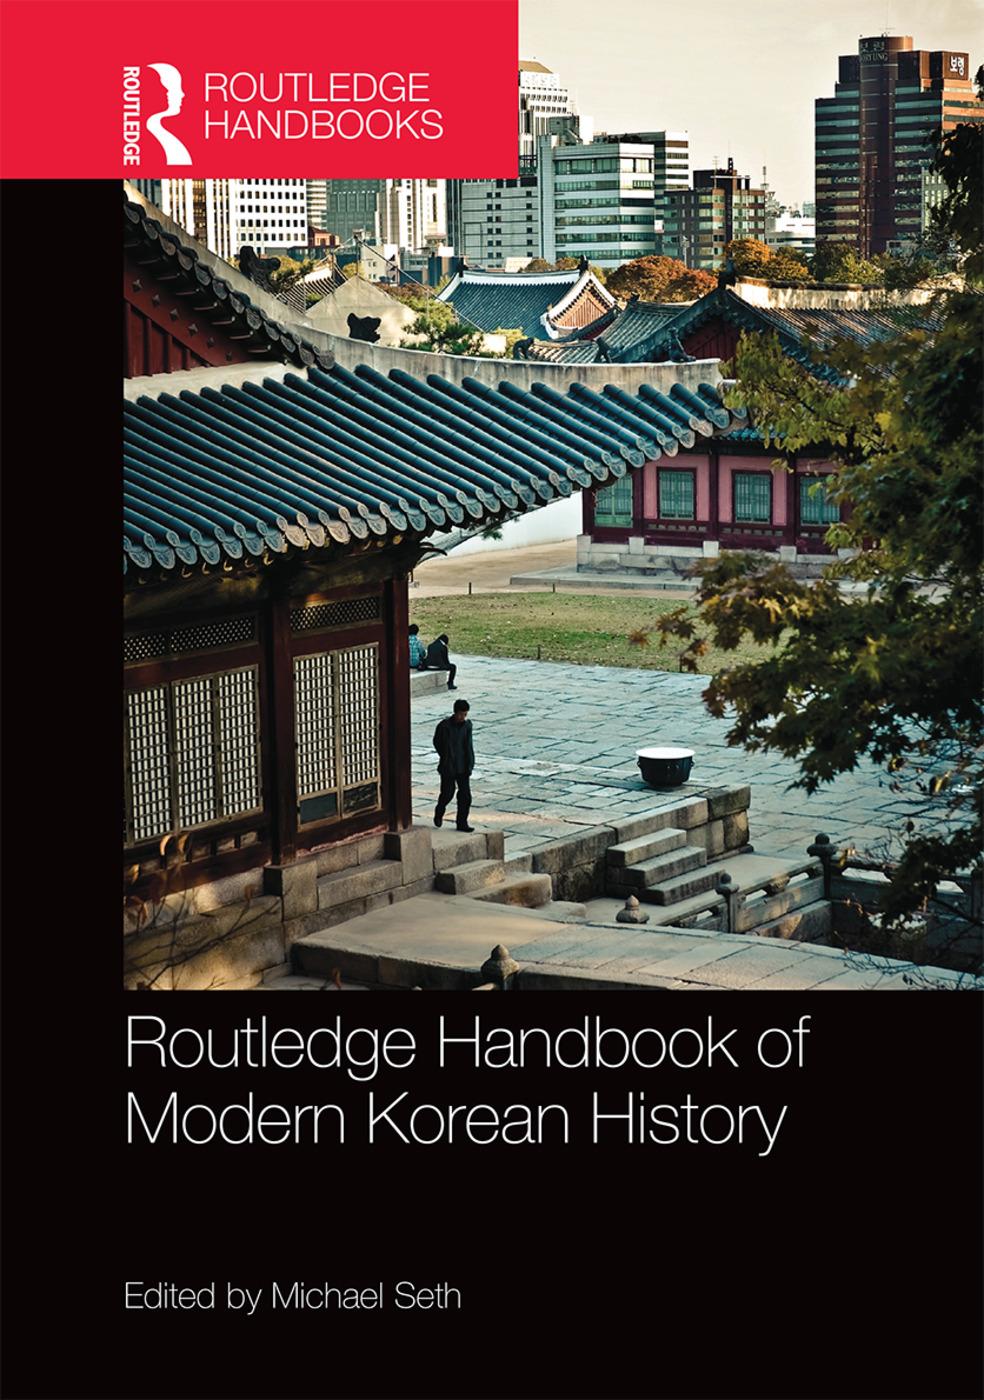 Routledge Handbook of Modern Korean History book cover